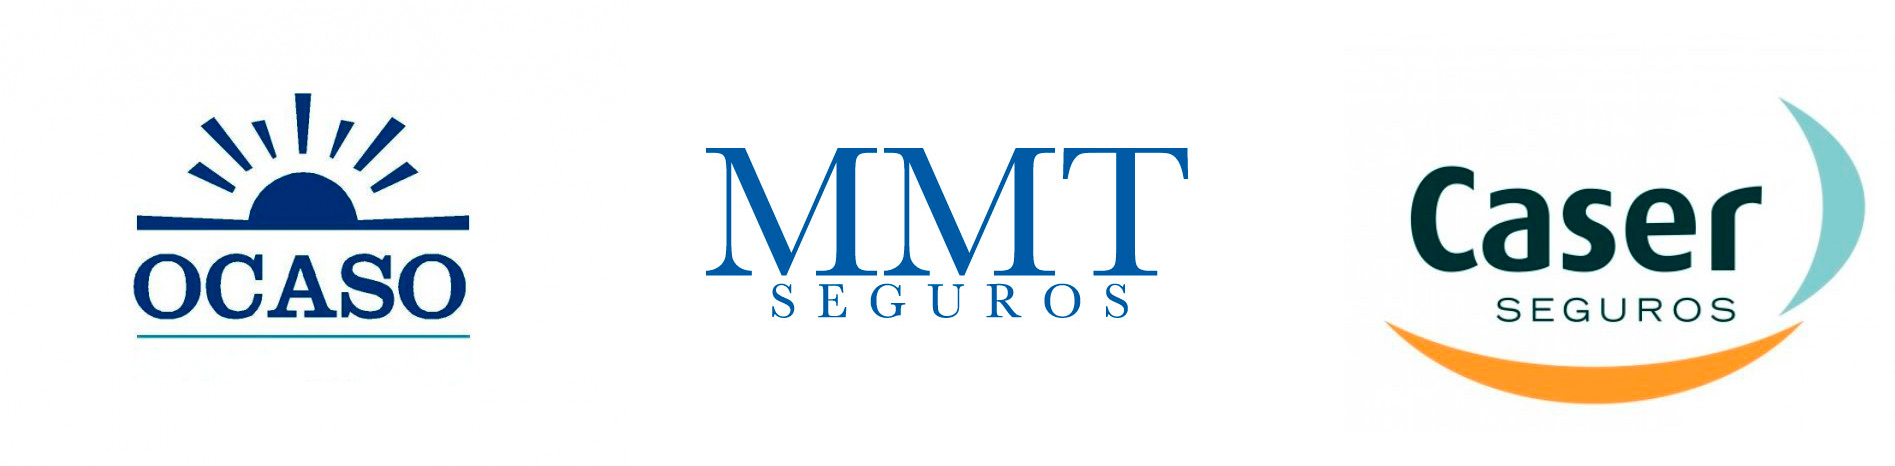 seguros_cmg